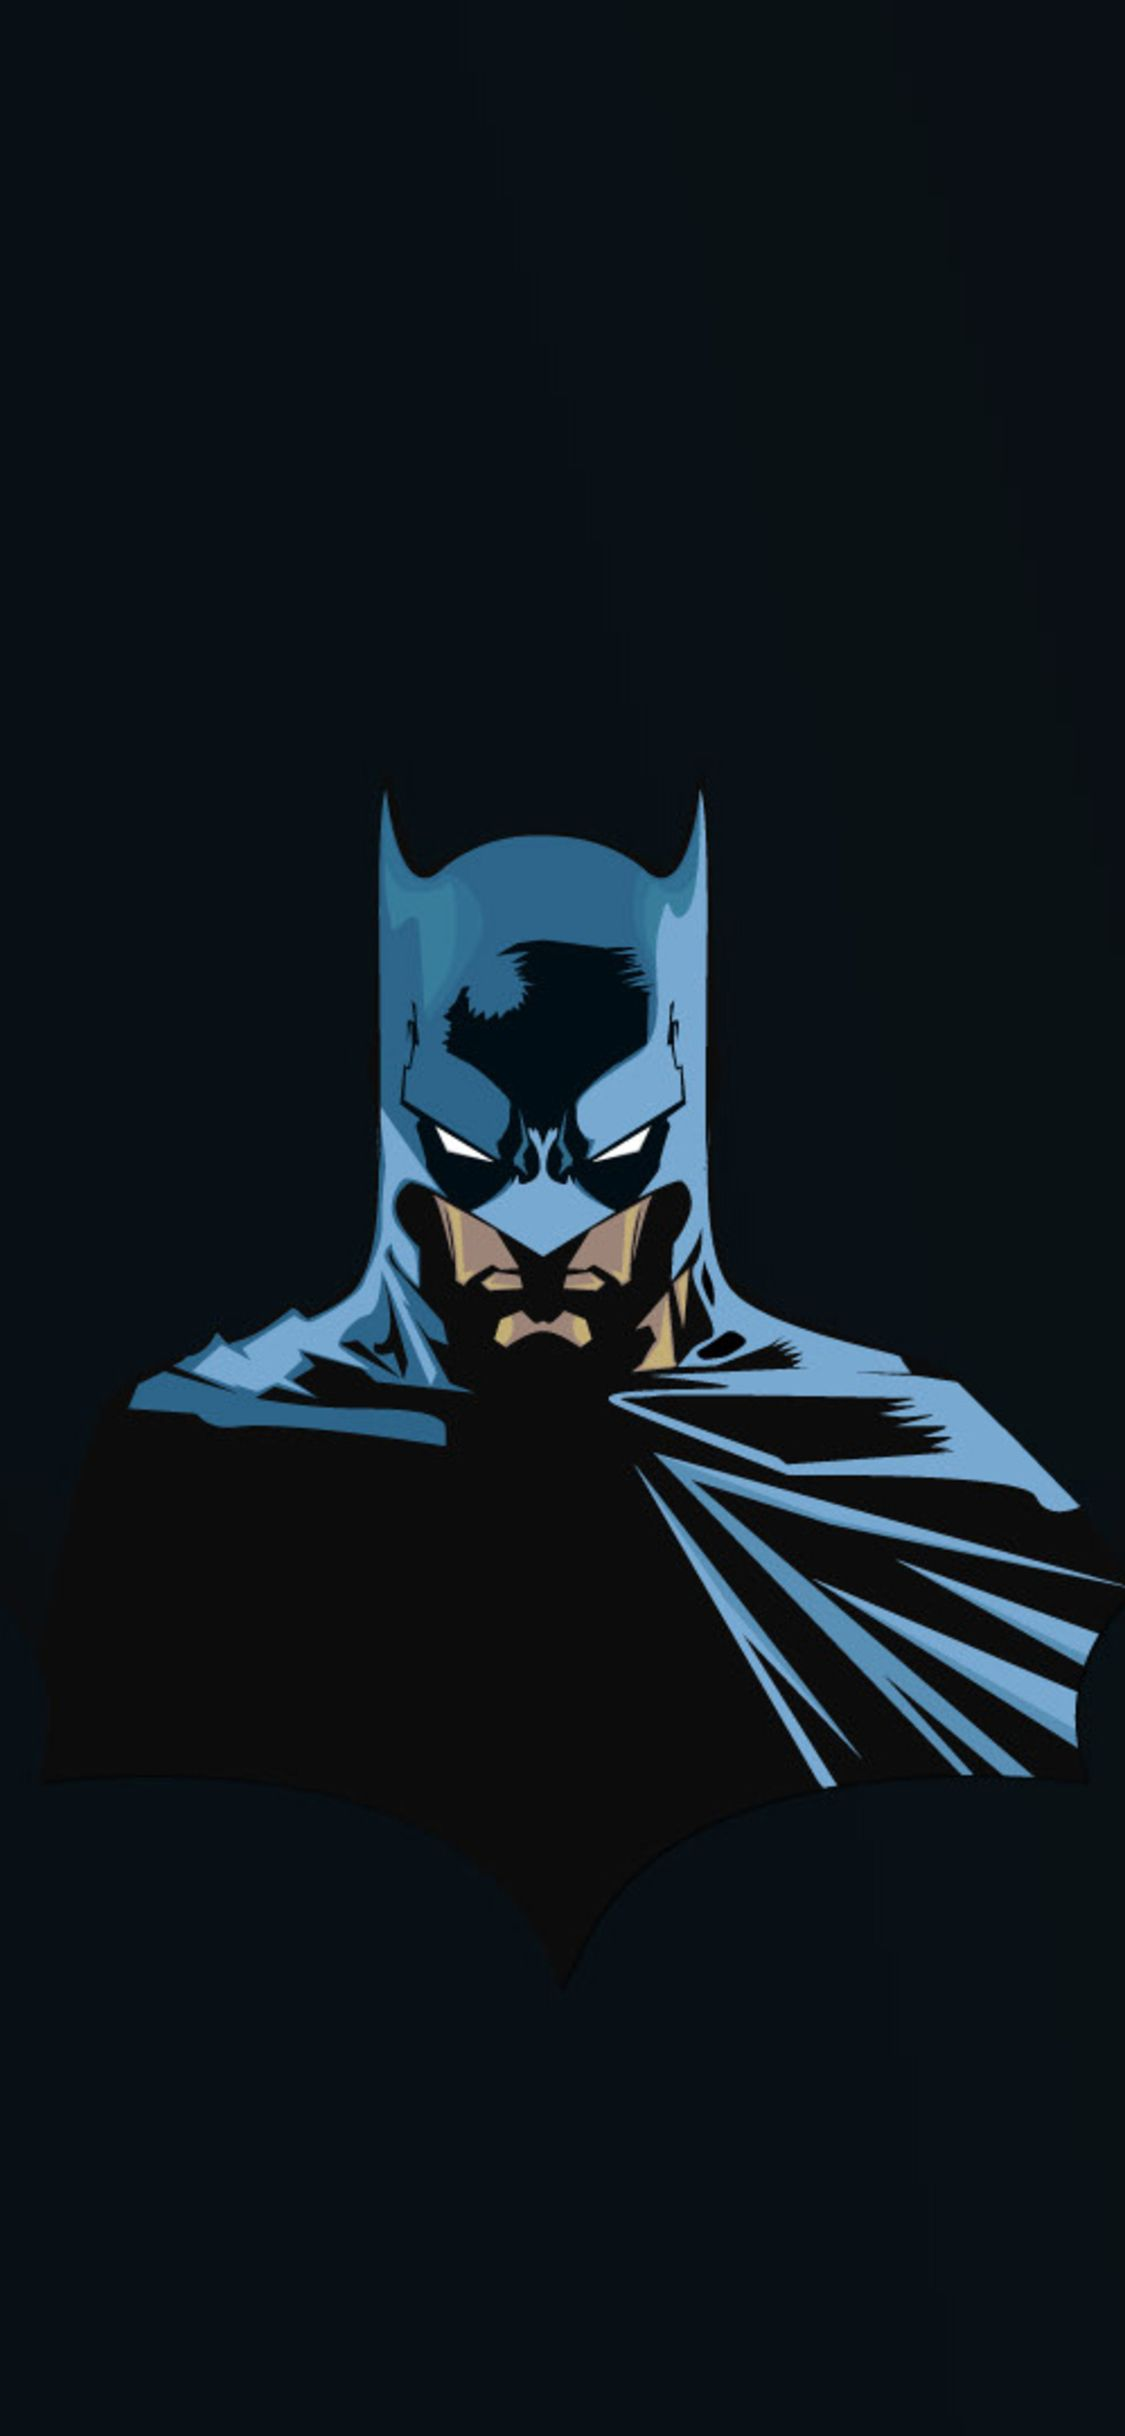 Iphone Xs Wallpaper Batman Ipcwallpapers Batman Wallpaper Batman Wallpaper Iphone Superman Hd Wallpaper 1080p batman phone wallpaper